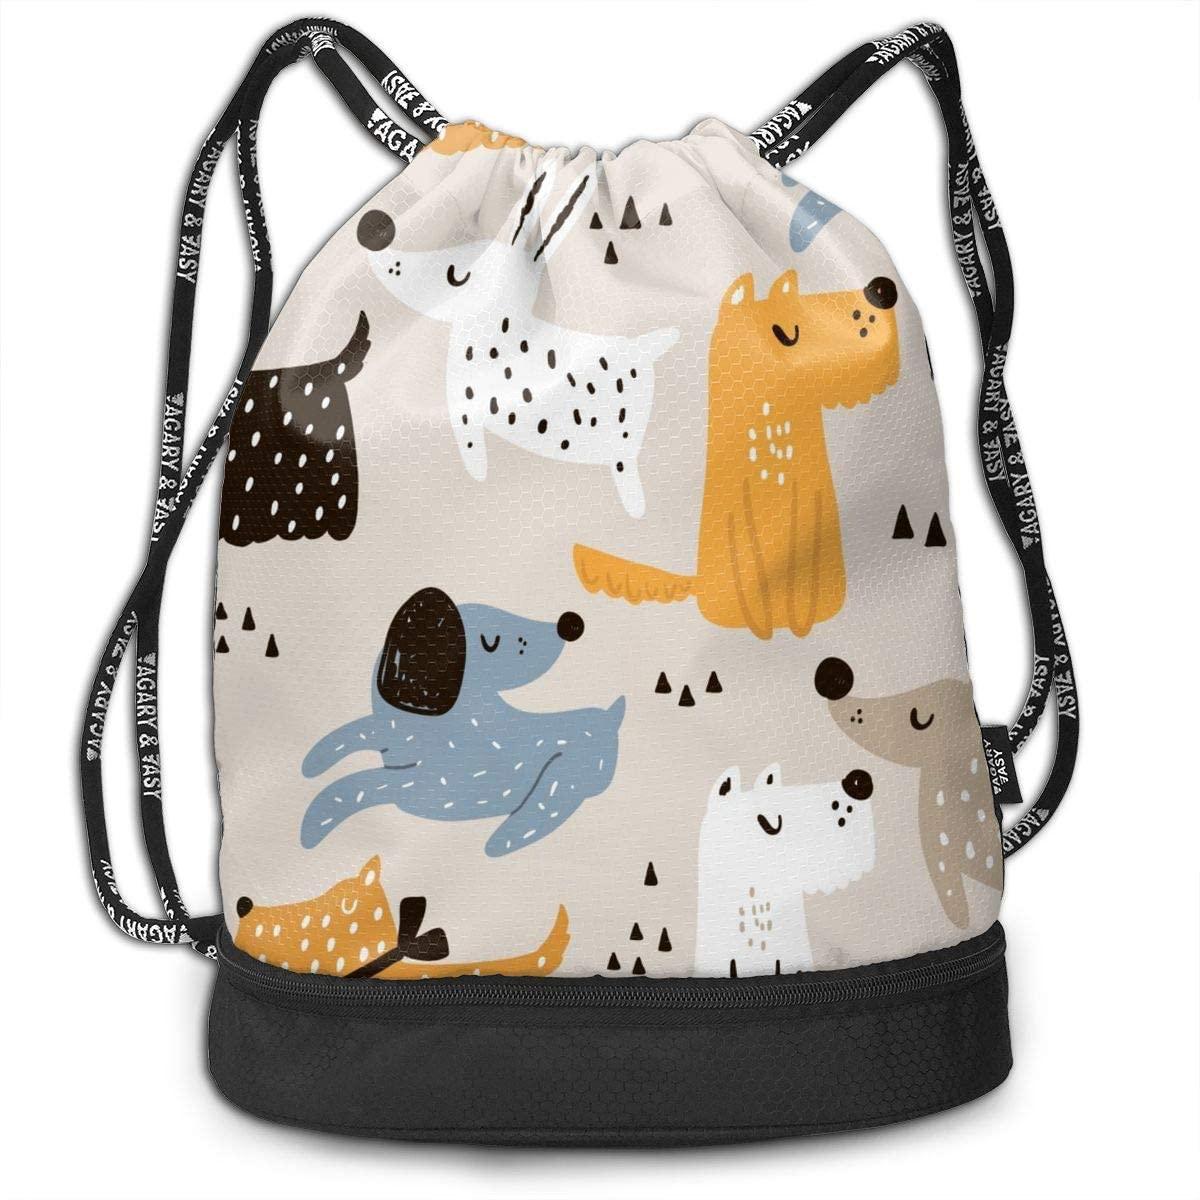 Bundle Backpacks Hand Drawn Dogs Gym Sack Drawstring Bags Casual Daypack Yoga Bag School Training Pouch